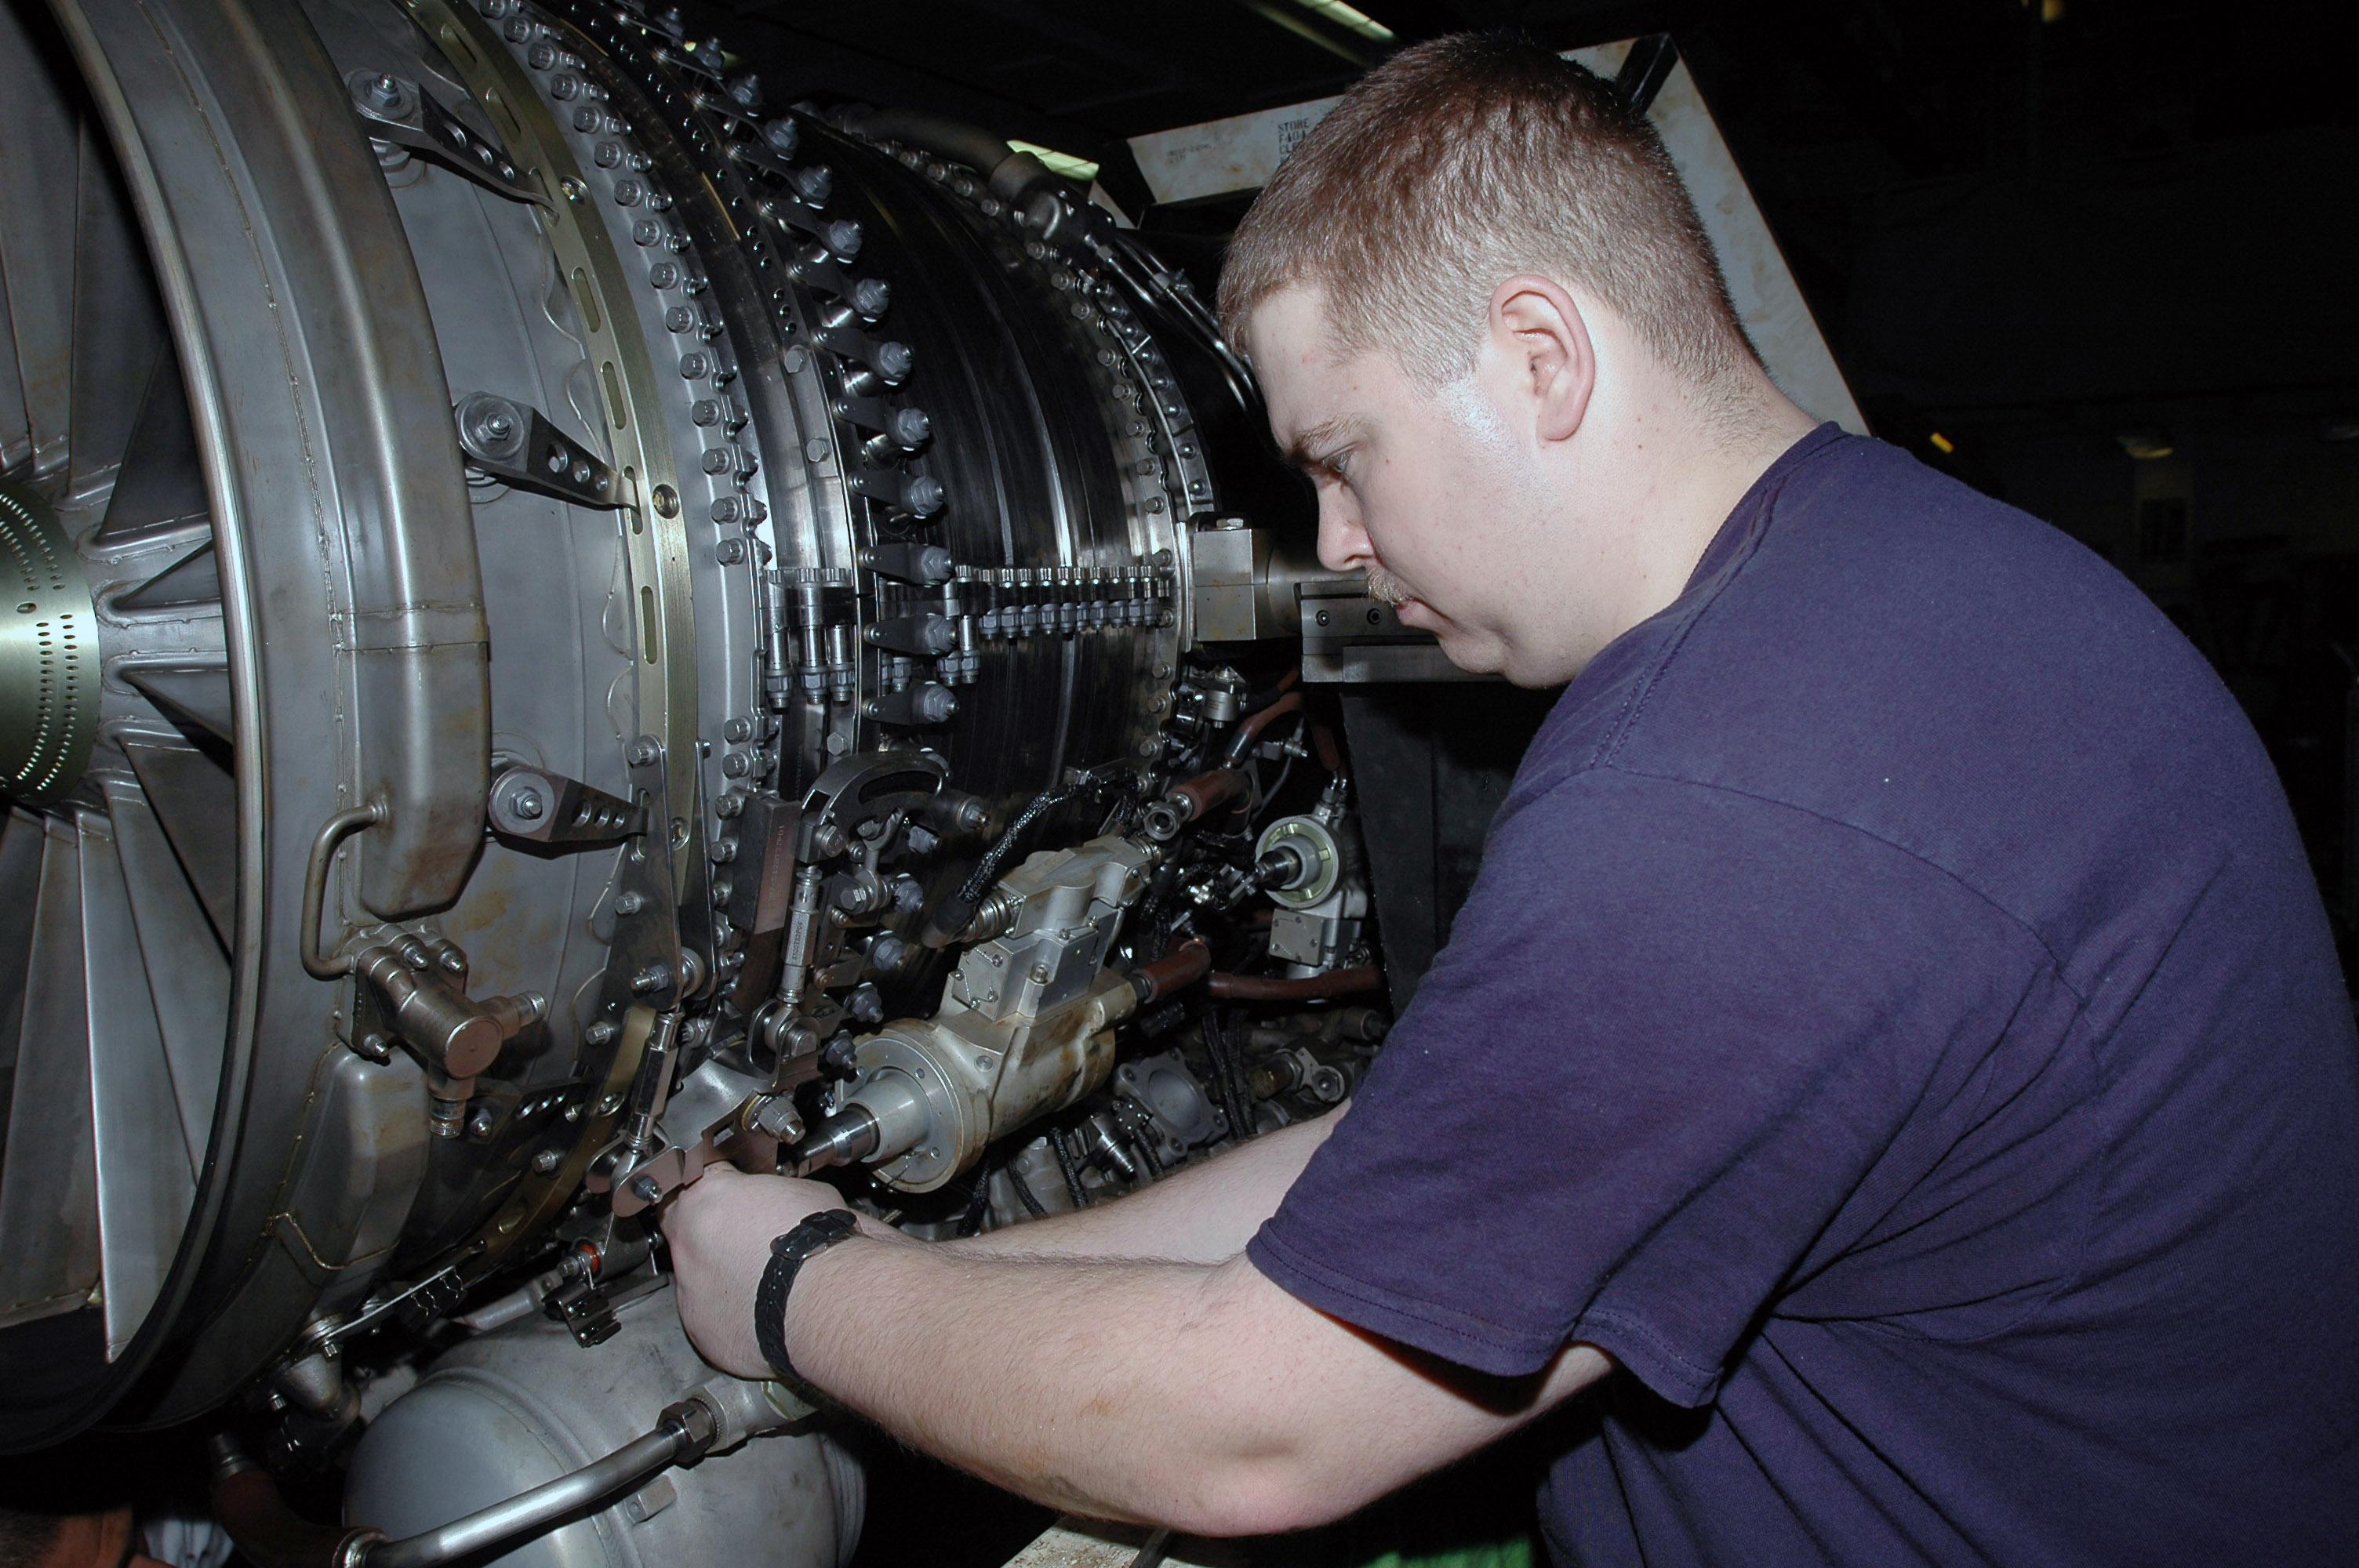 fileus navy 070825 n 1730j 069 aviation machinists mate 3rd class